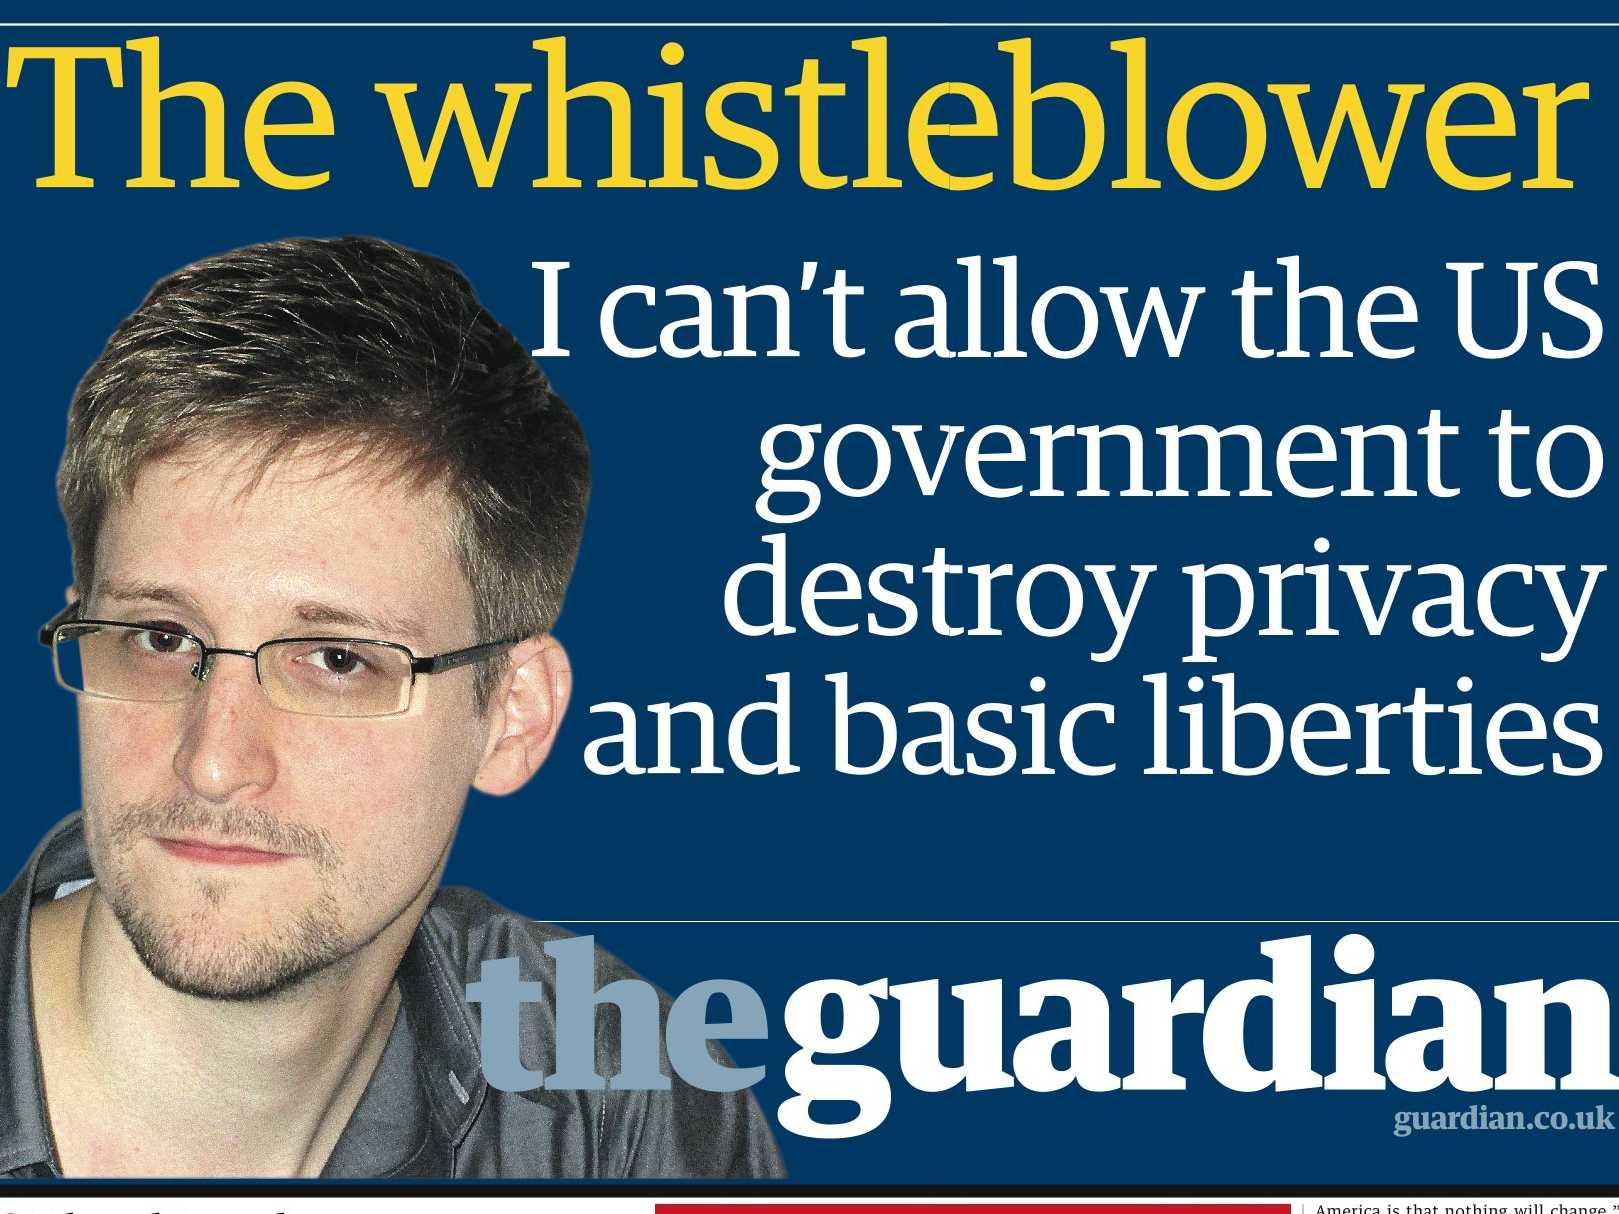 Edward Snowden's quote #1